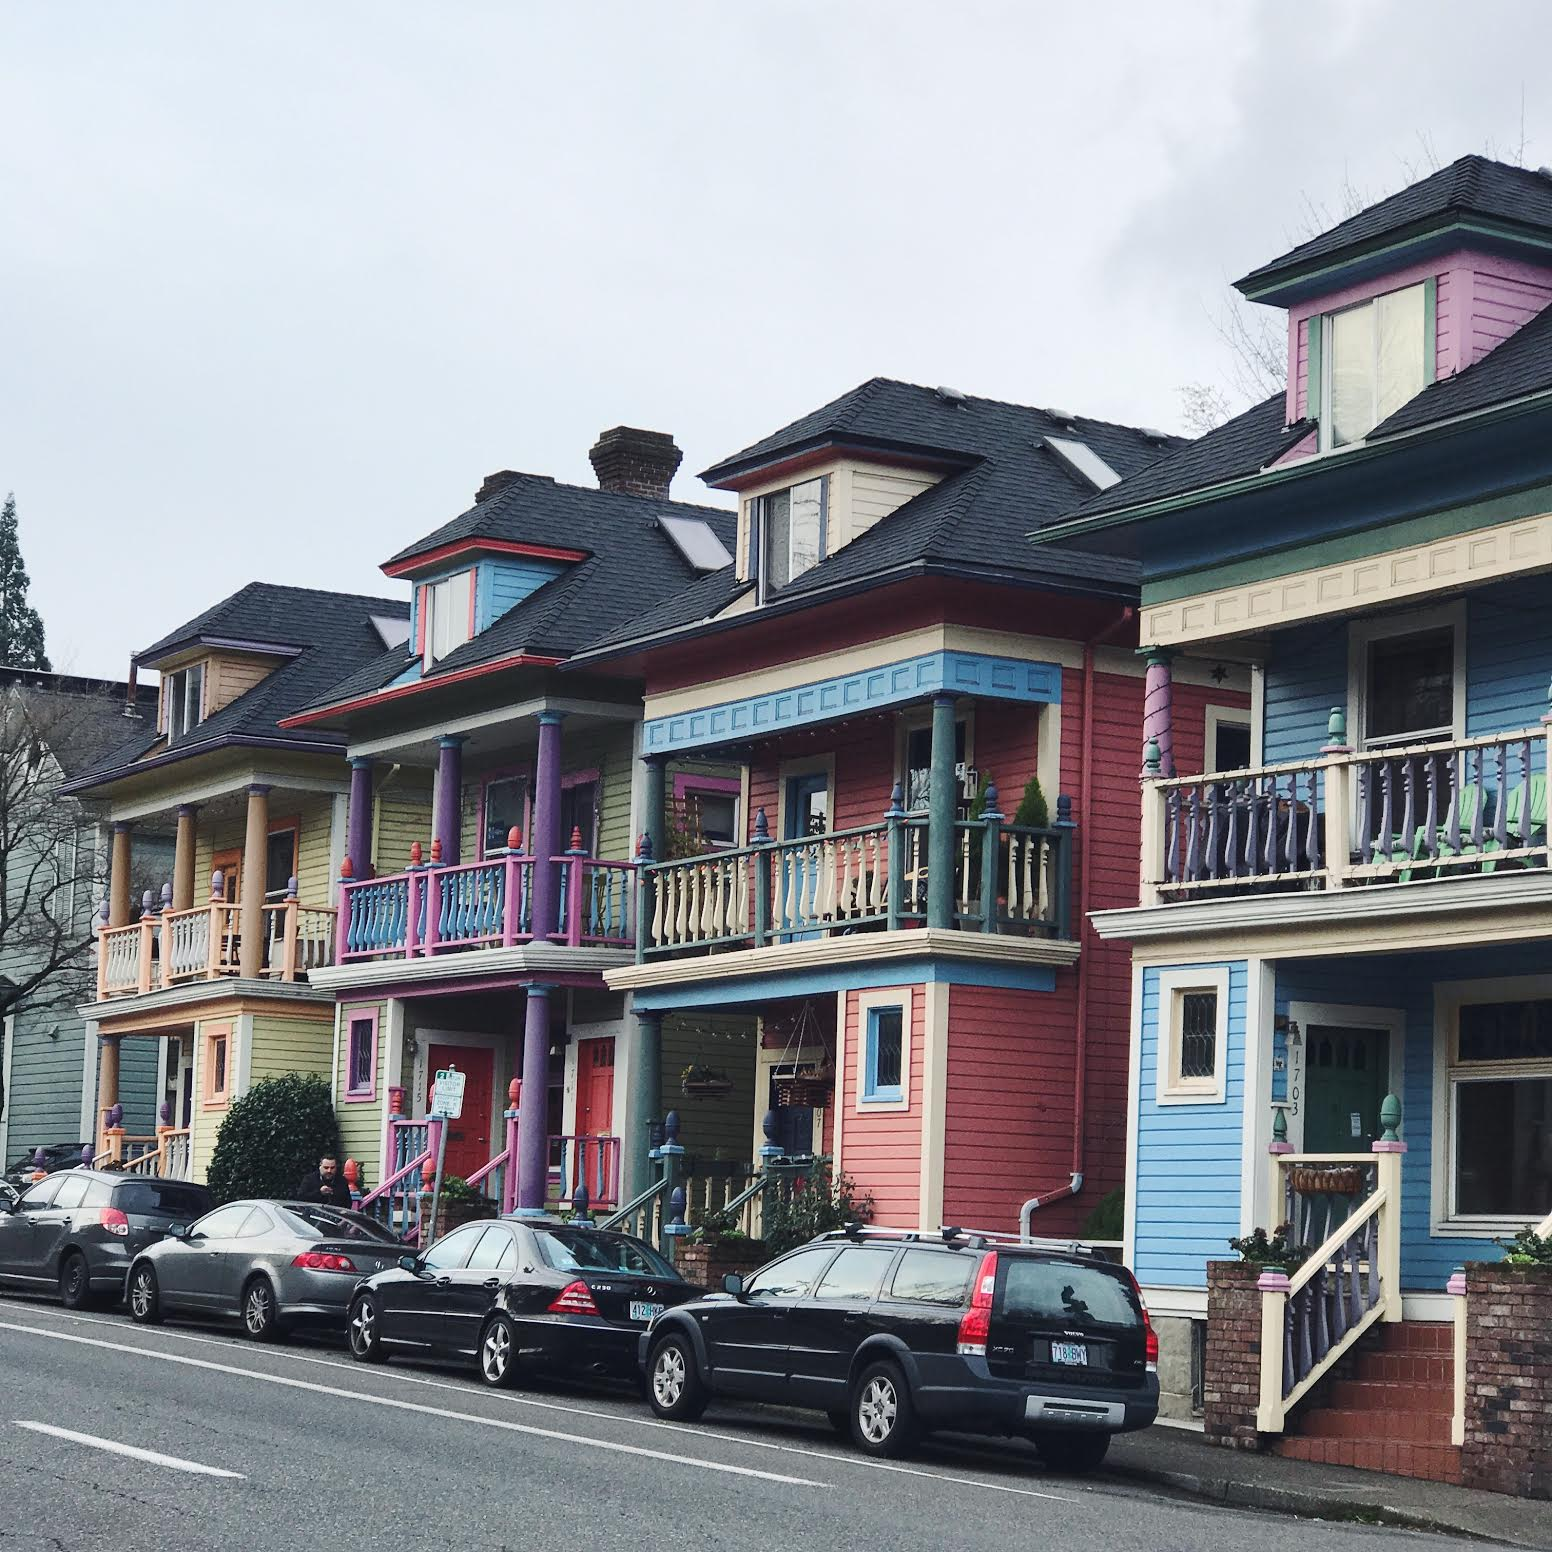 Portland Houses, Colorful houses, Travel